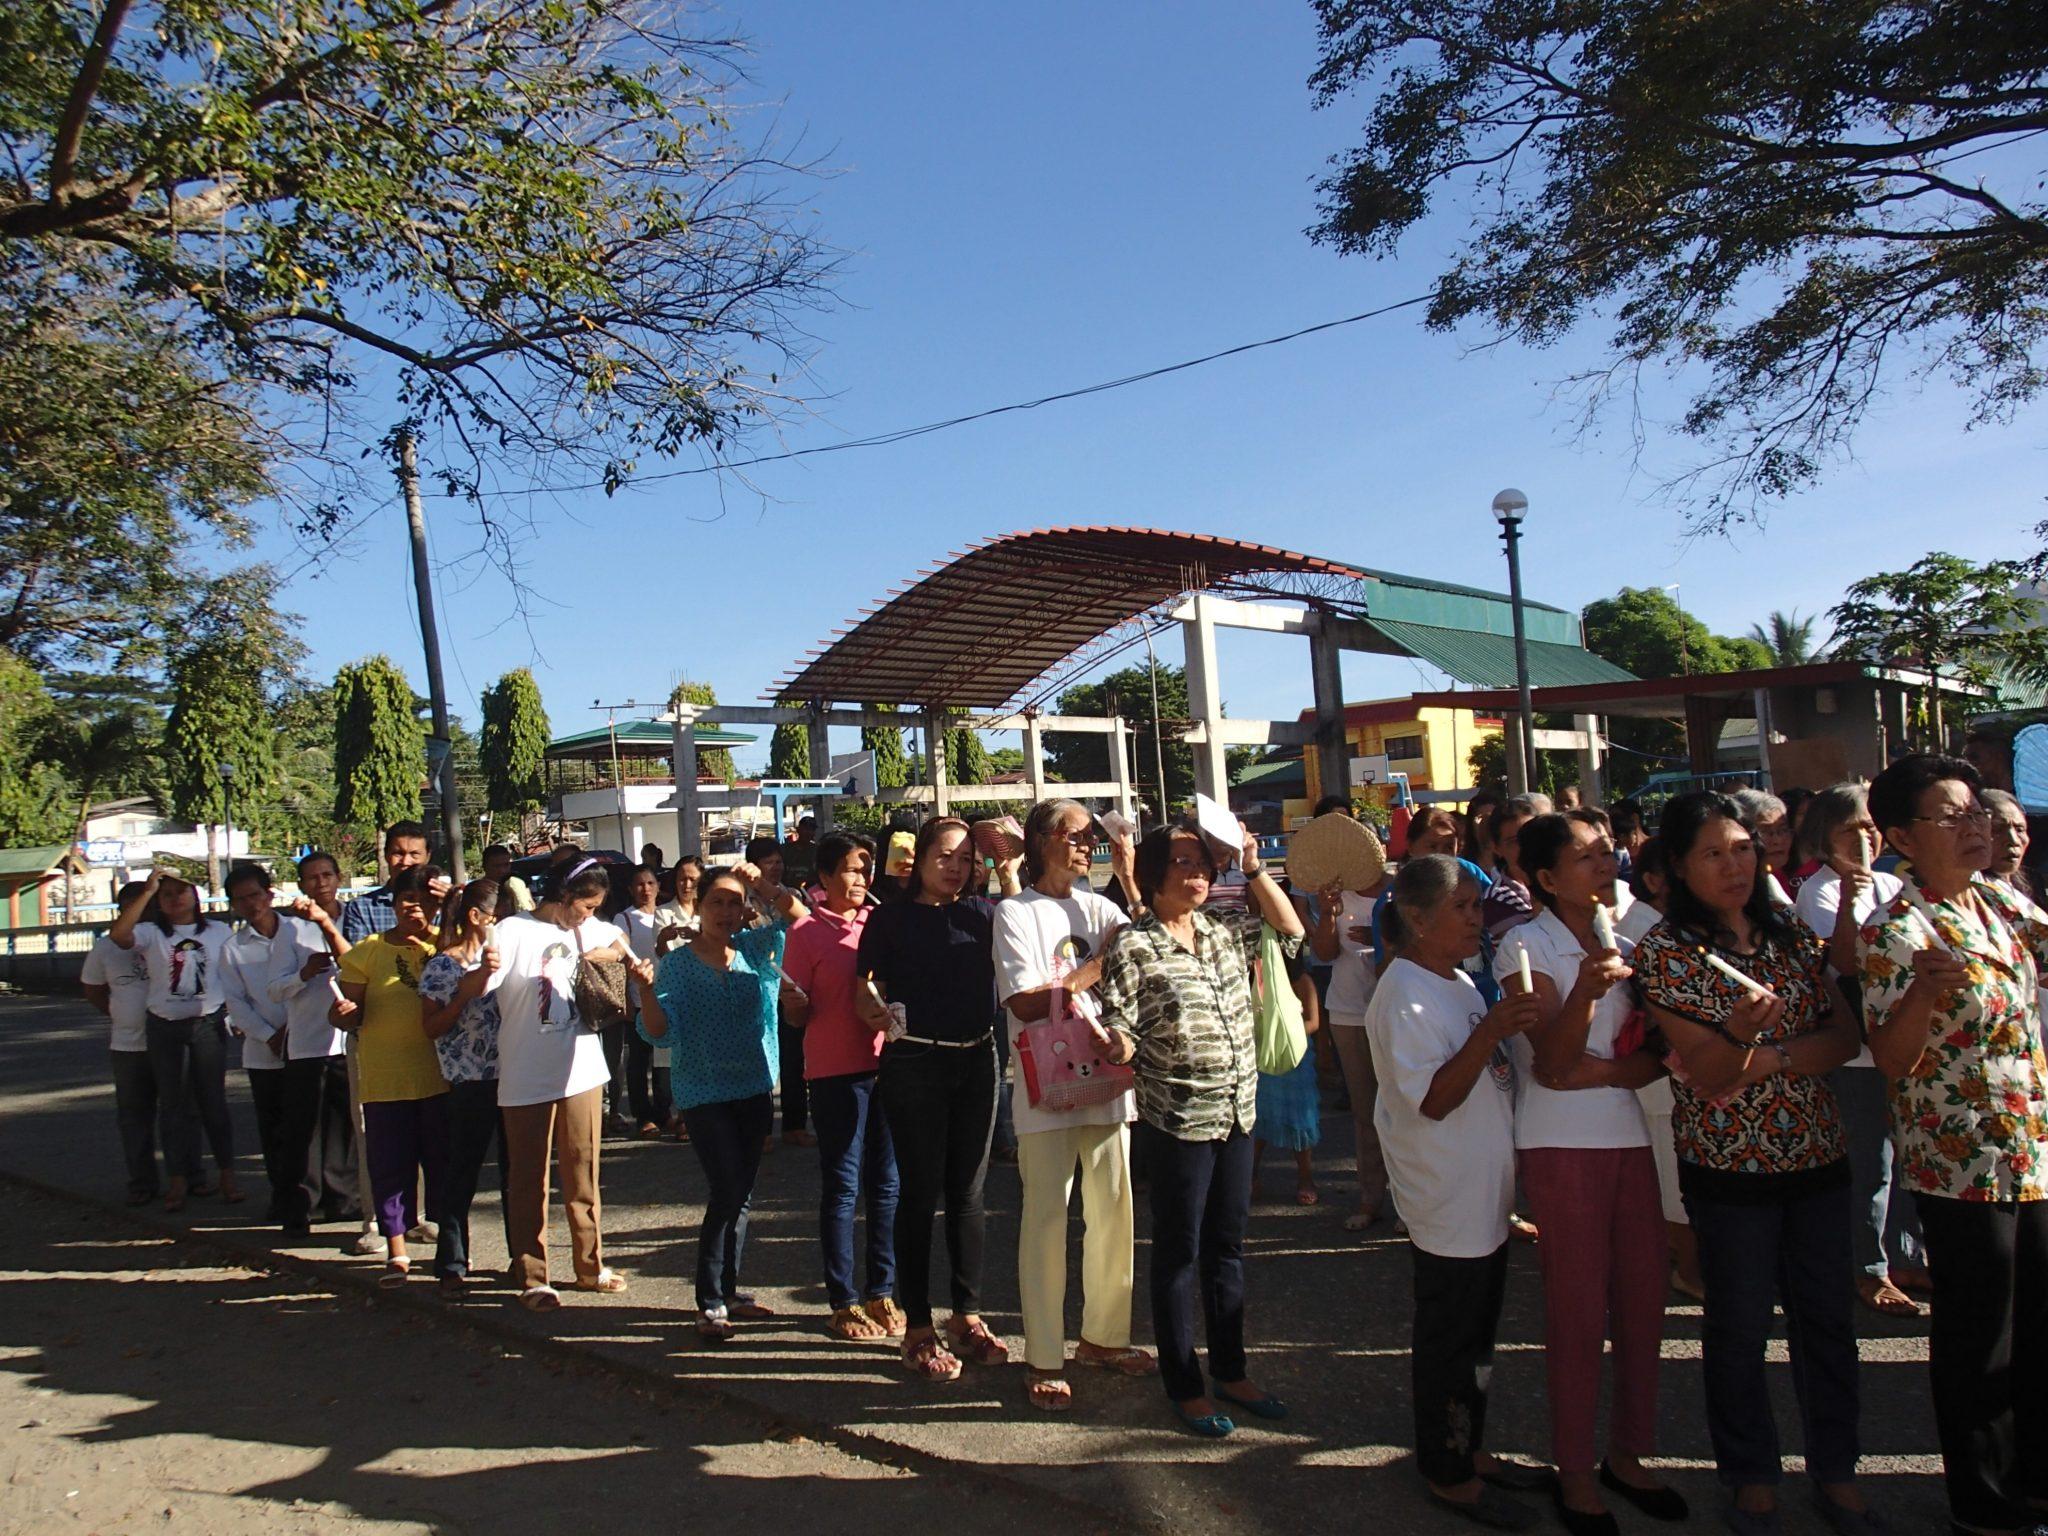 Philippines: Celebrating the Black Nazarene